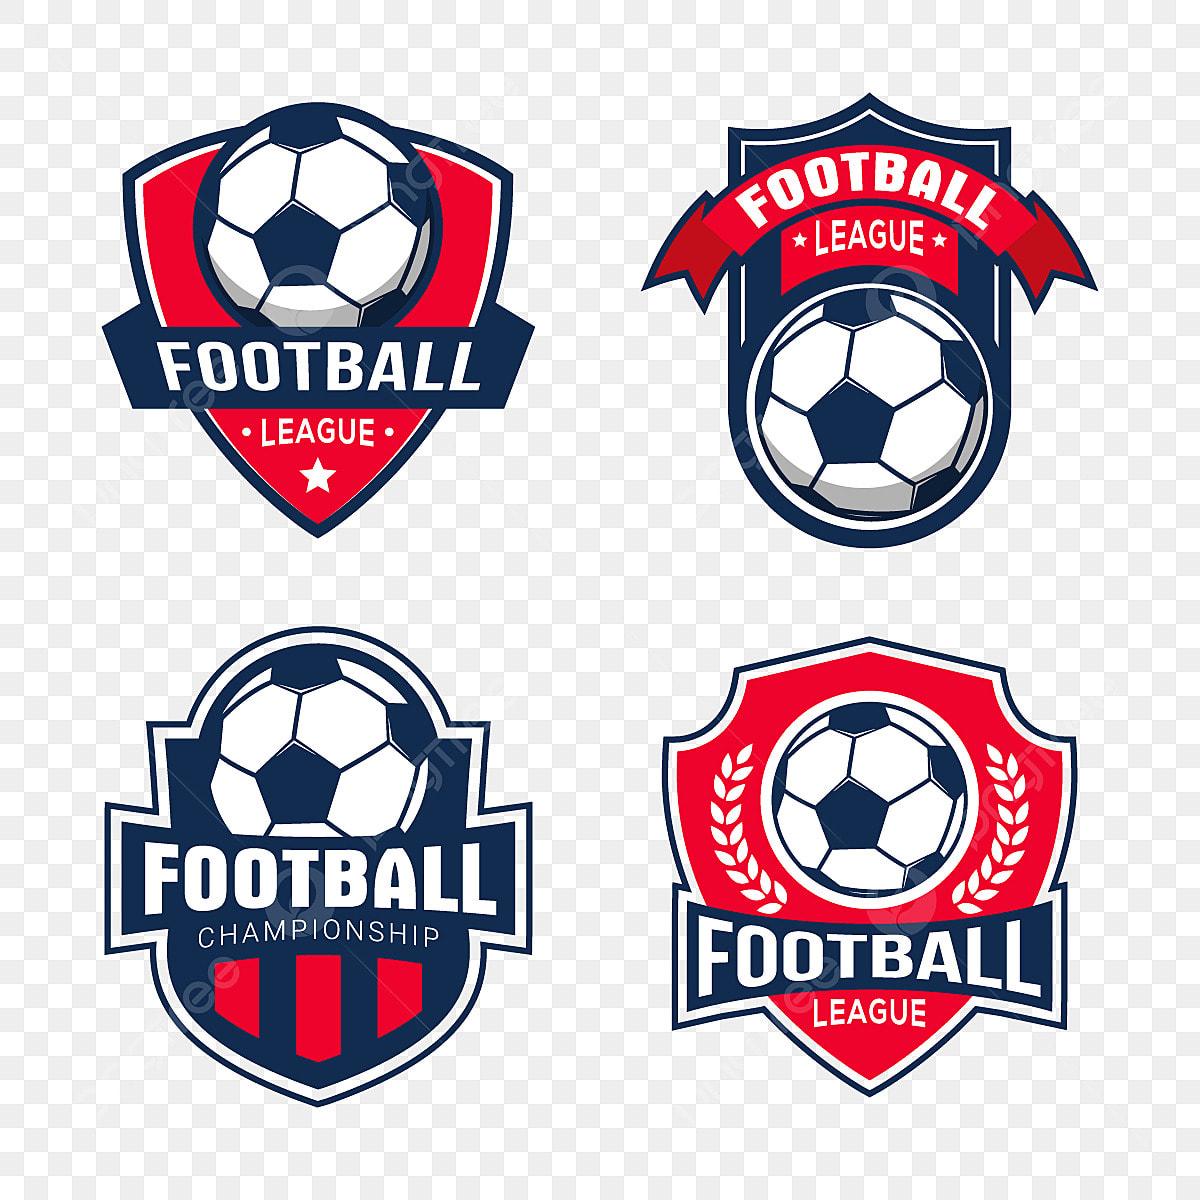 Football Logo Design Vector Free Download